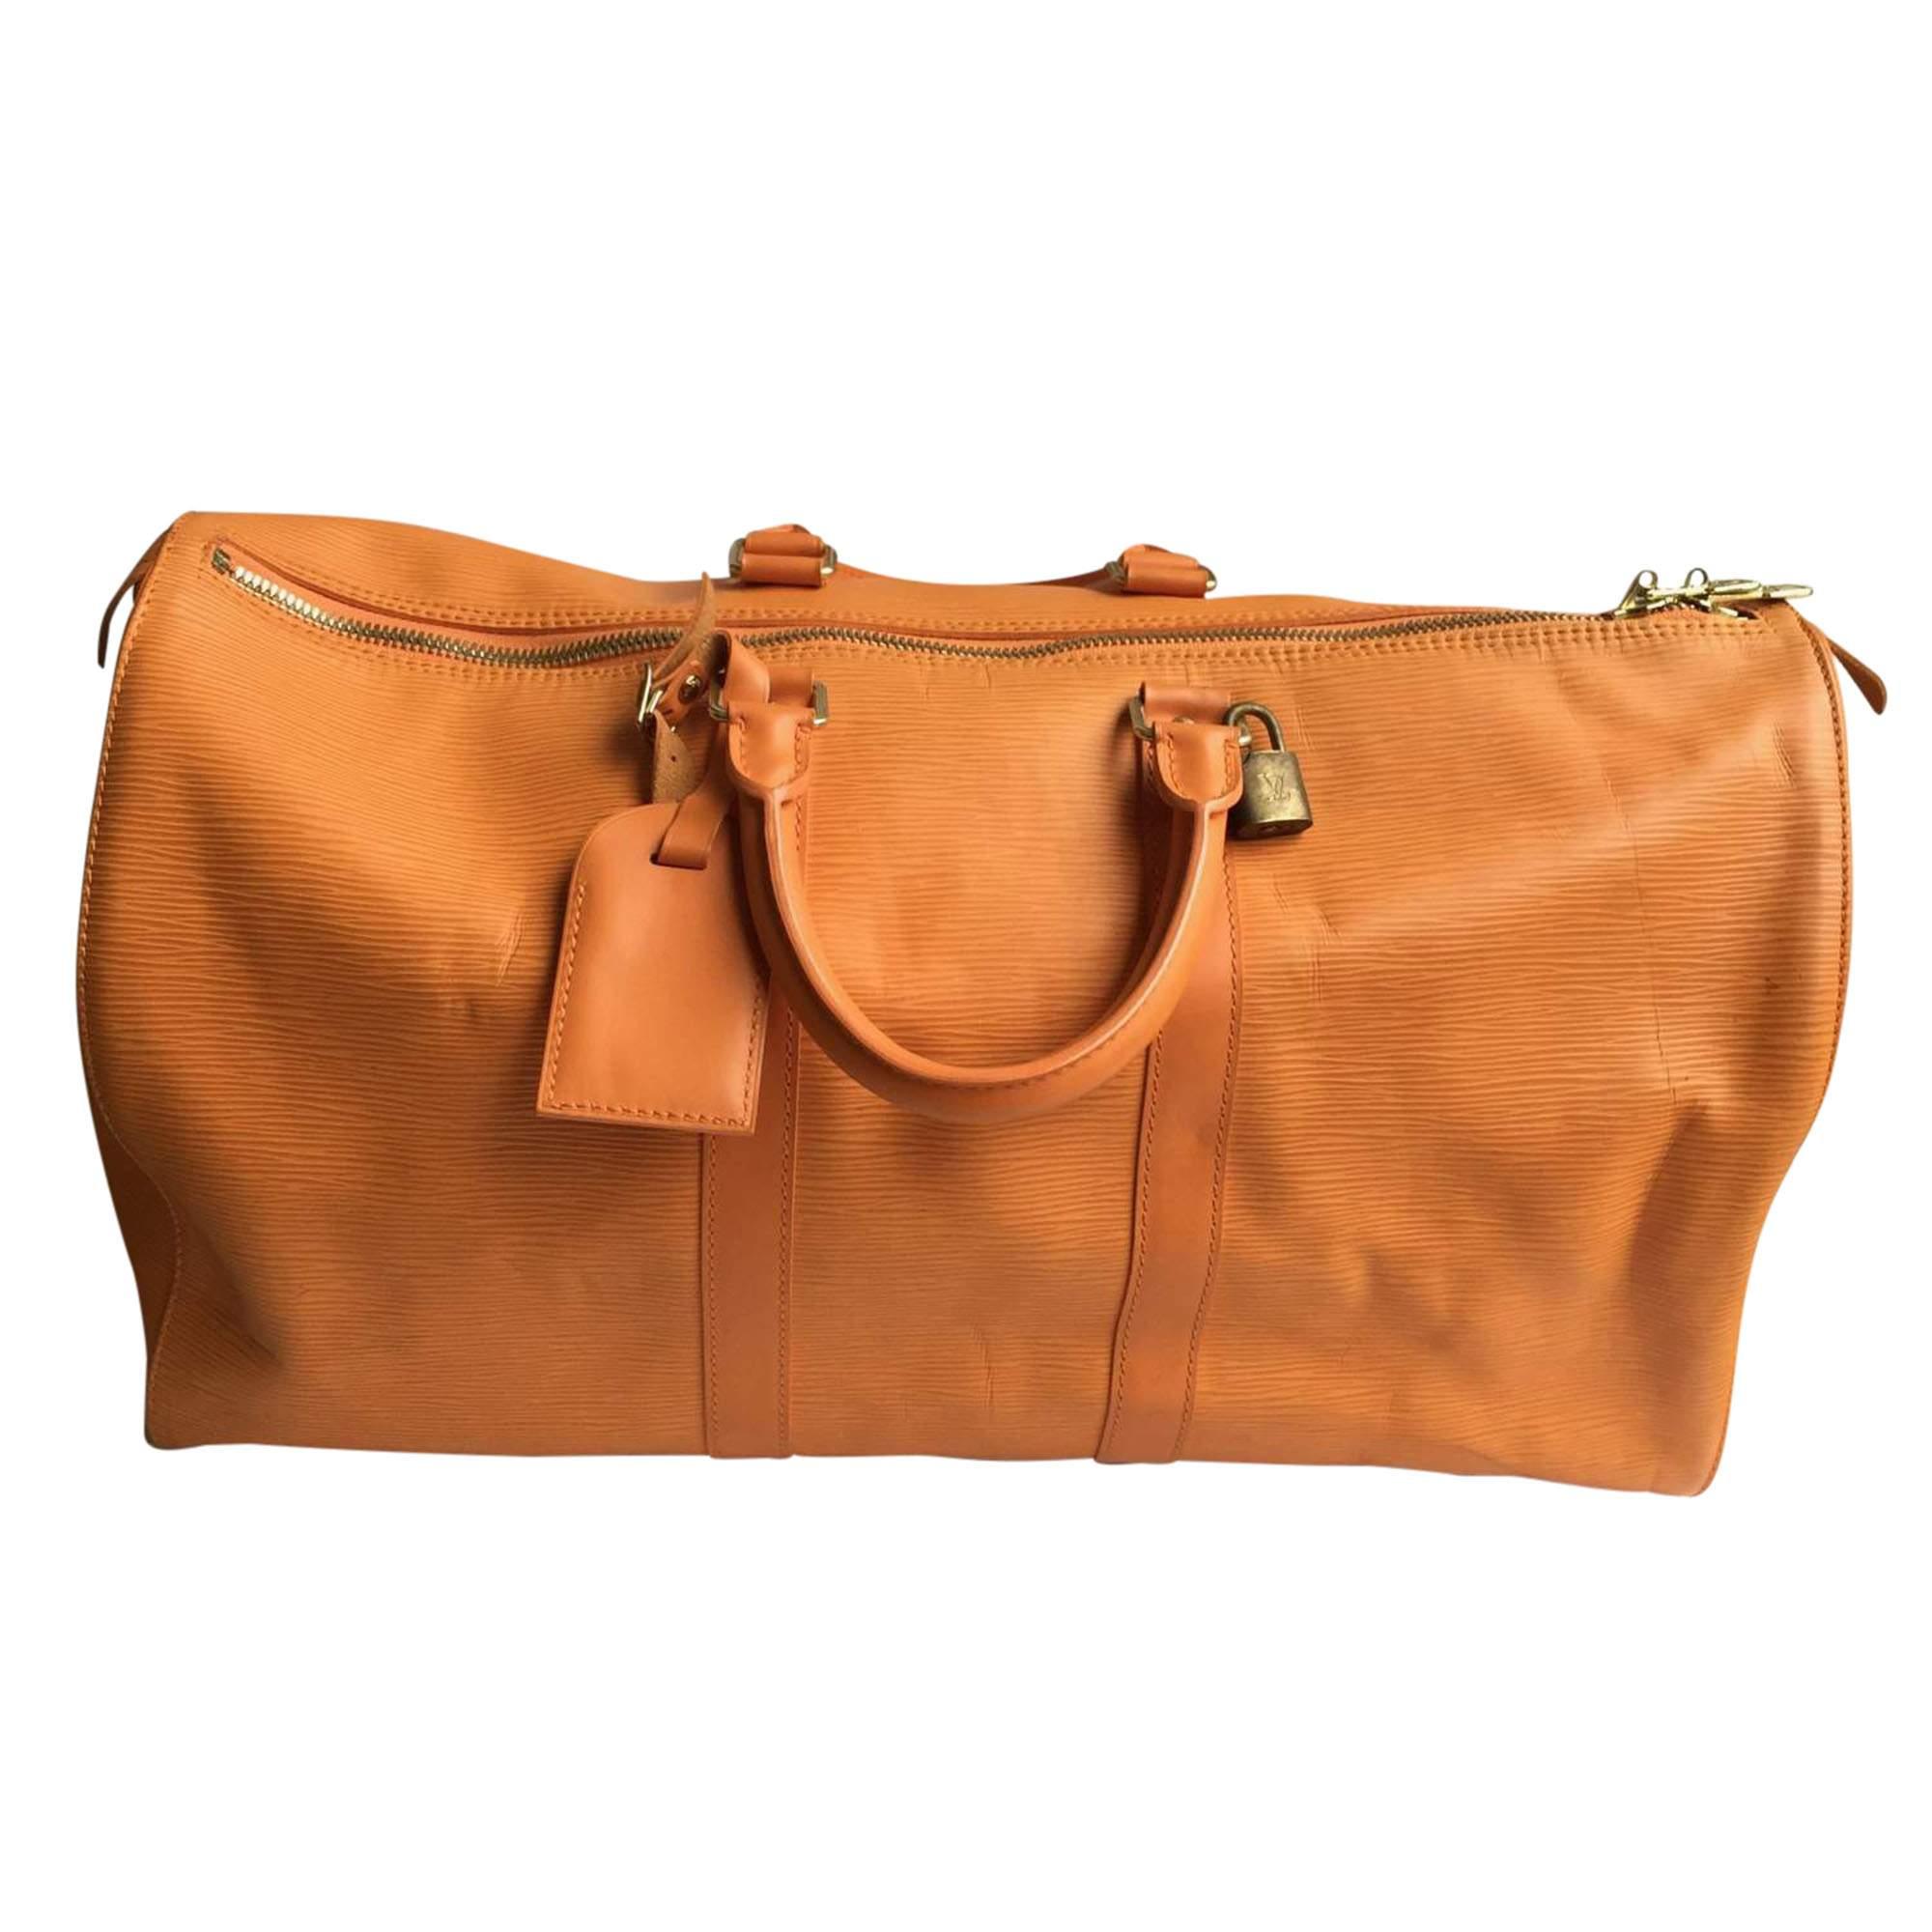 3fc33ec5f2 Louis Vuitton Keepall orange leather Travel Bag